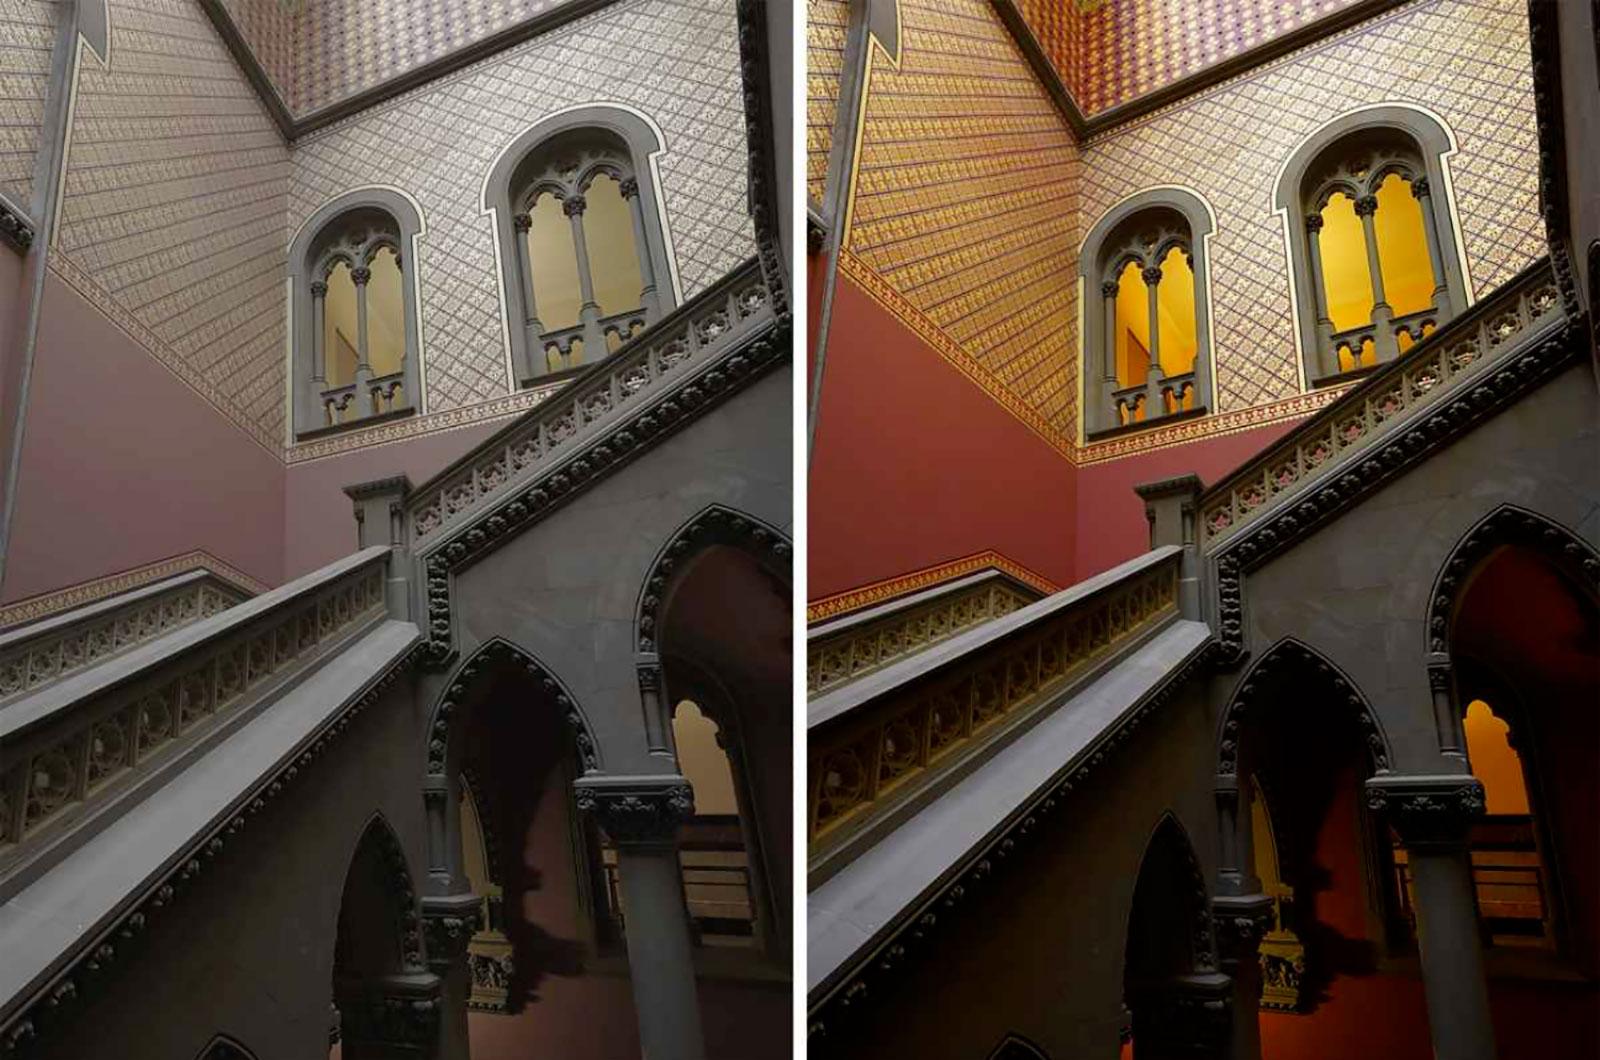 S-Log3-Before-After-Color-Grading.jpg